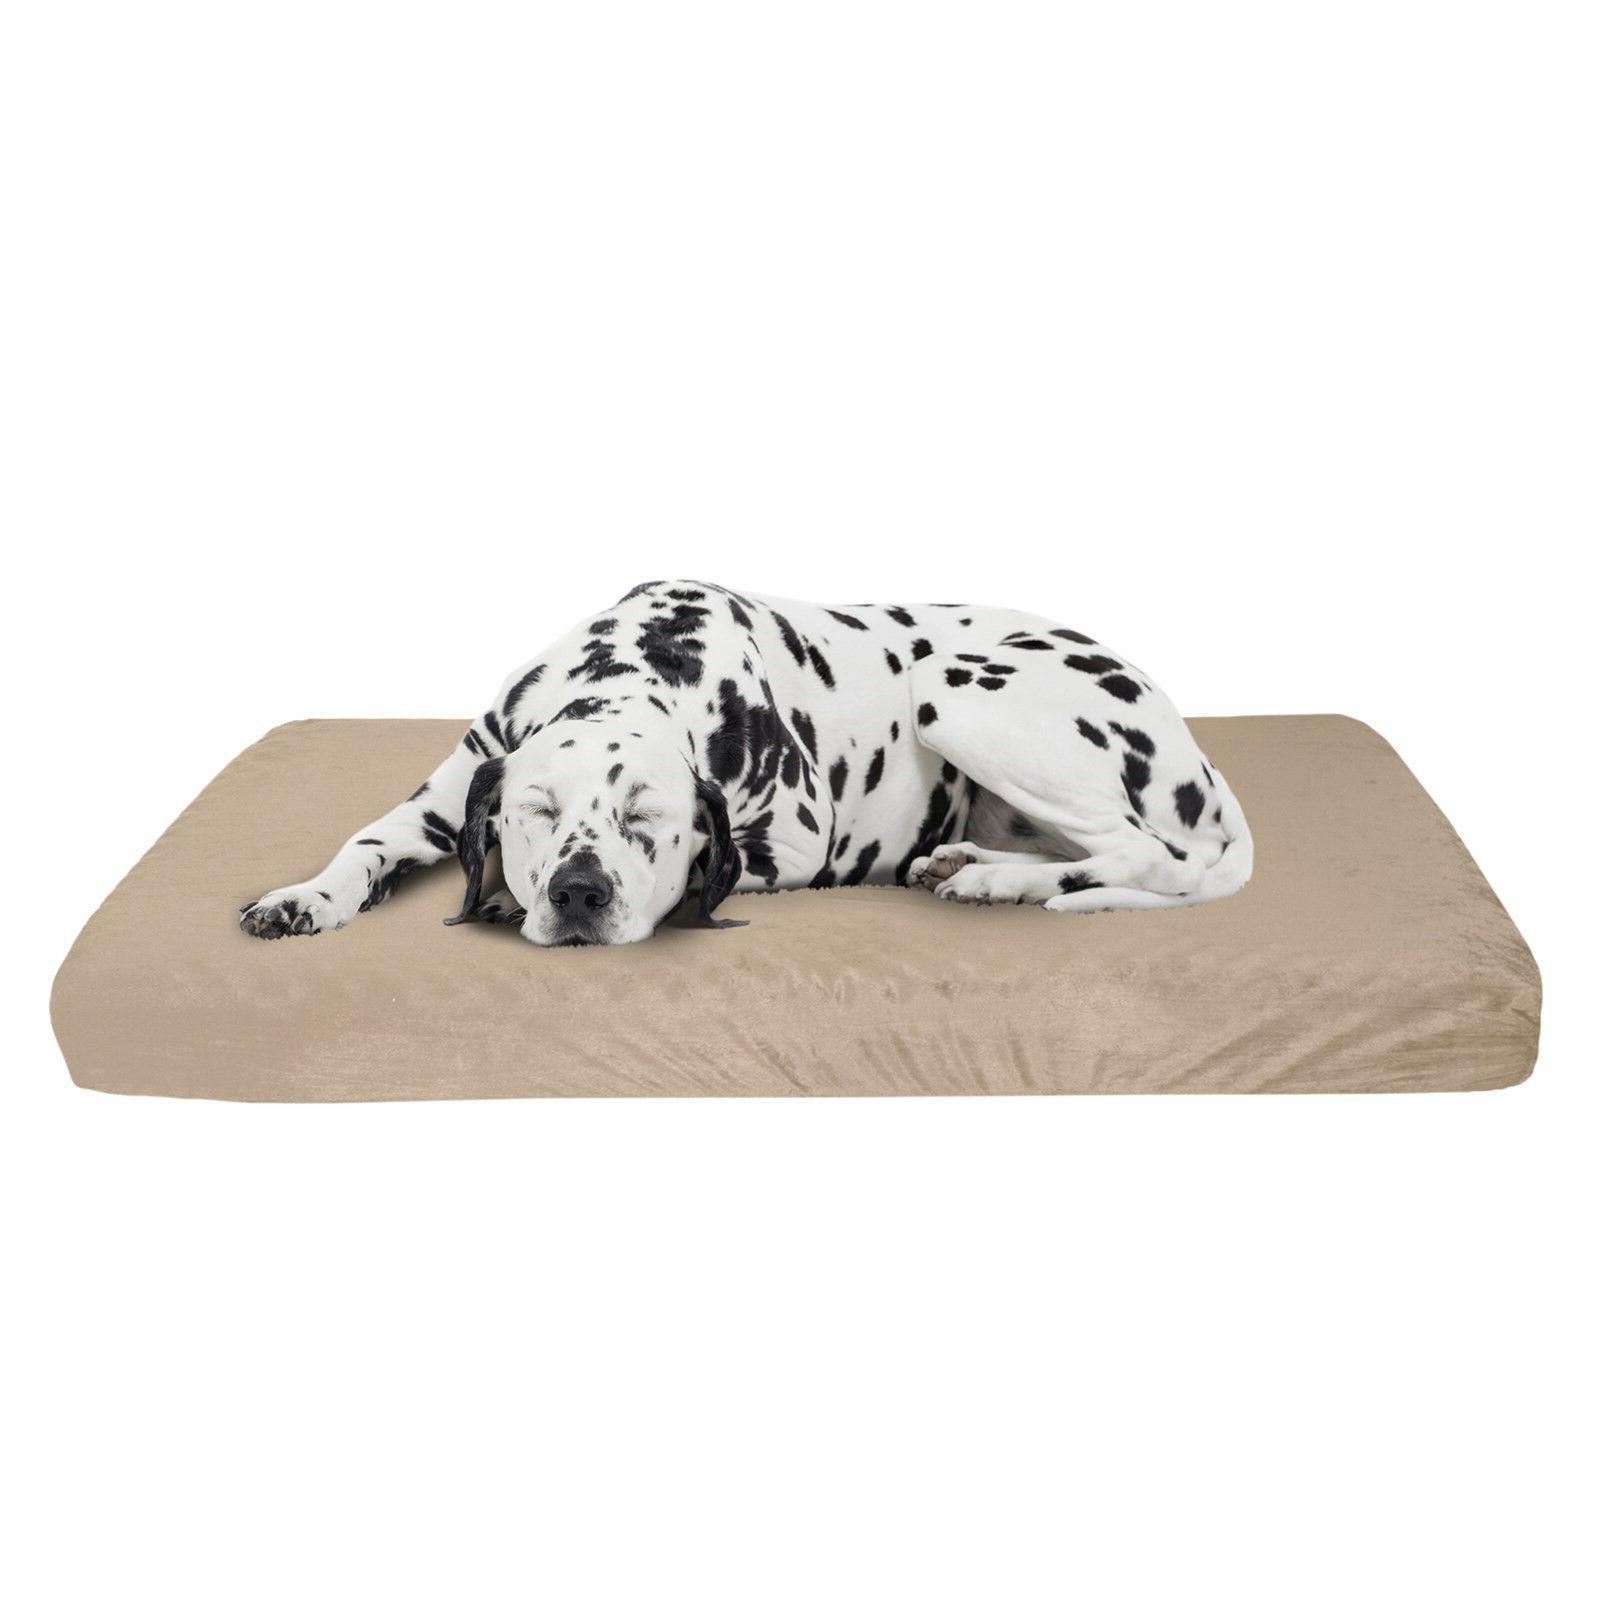 large orthopedic memory foam dog bed